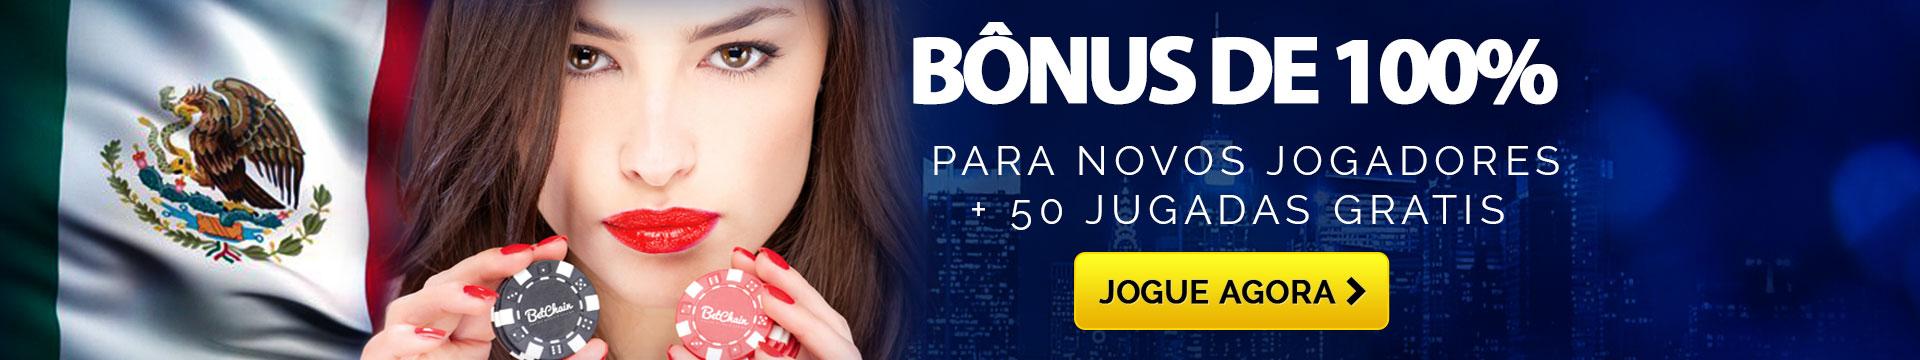 svenska online casino fairy tale online